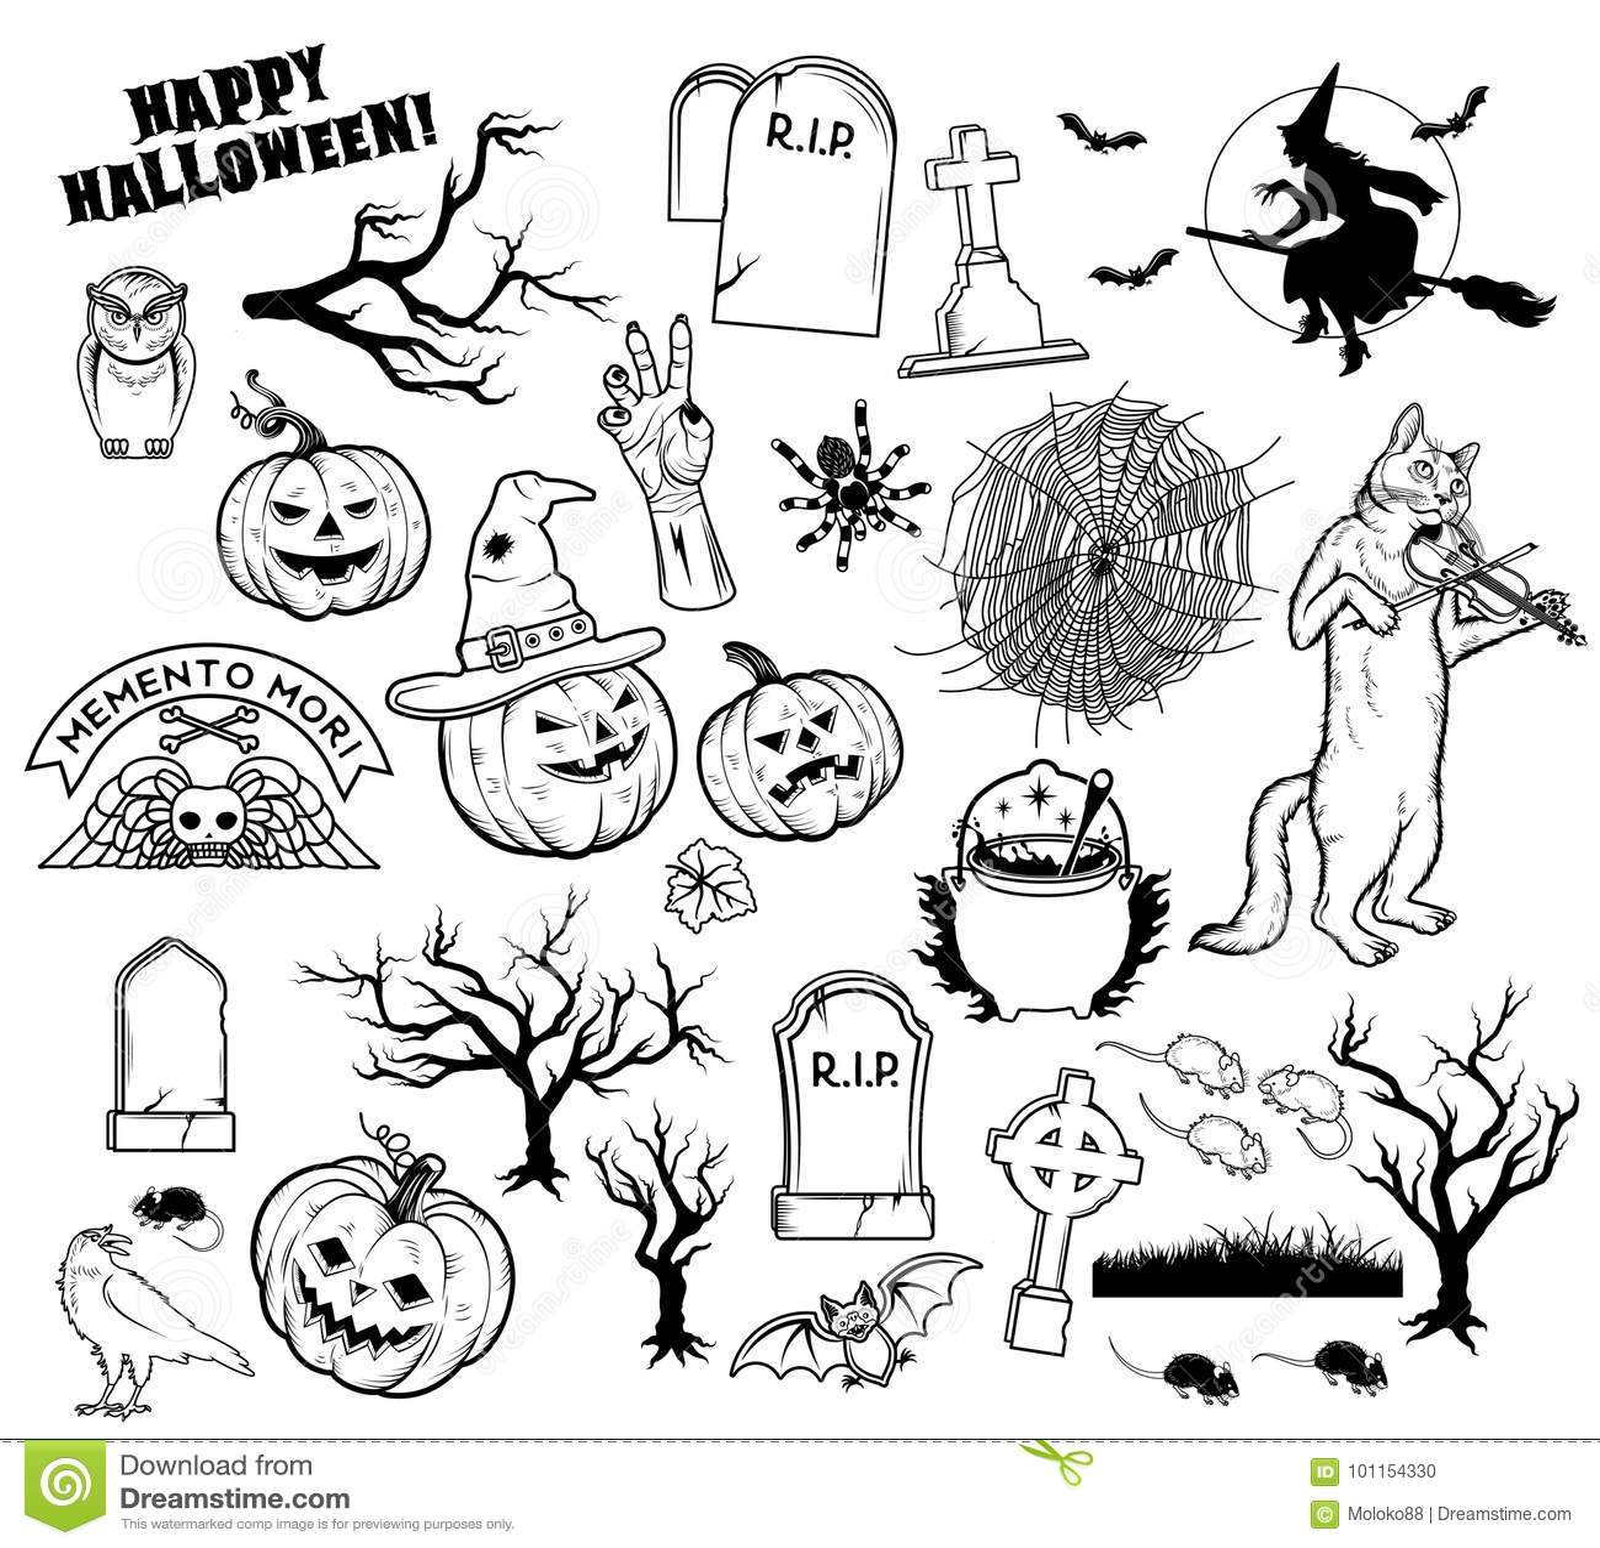 caract res de halloween de livre de coloriage illustration de vecteur illustration de vecteur. Black Bedroom Furniture Sets. Home Design Ideas